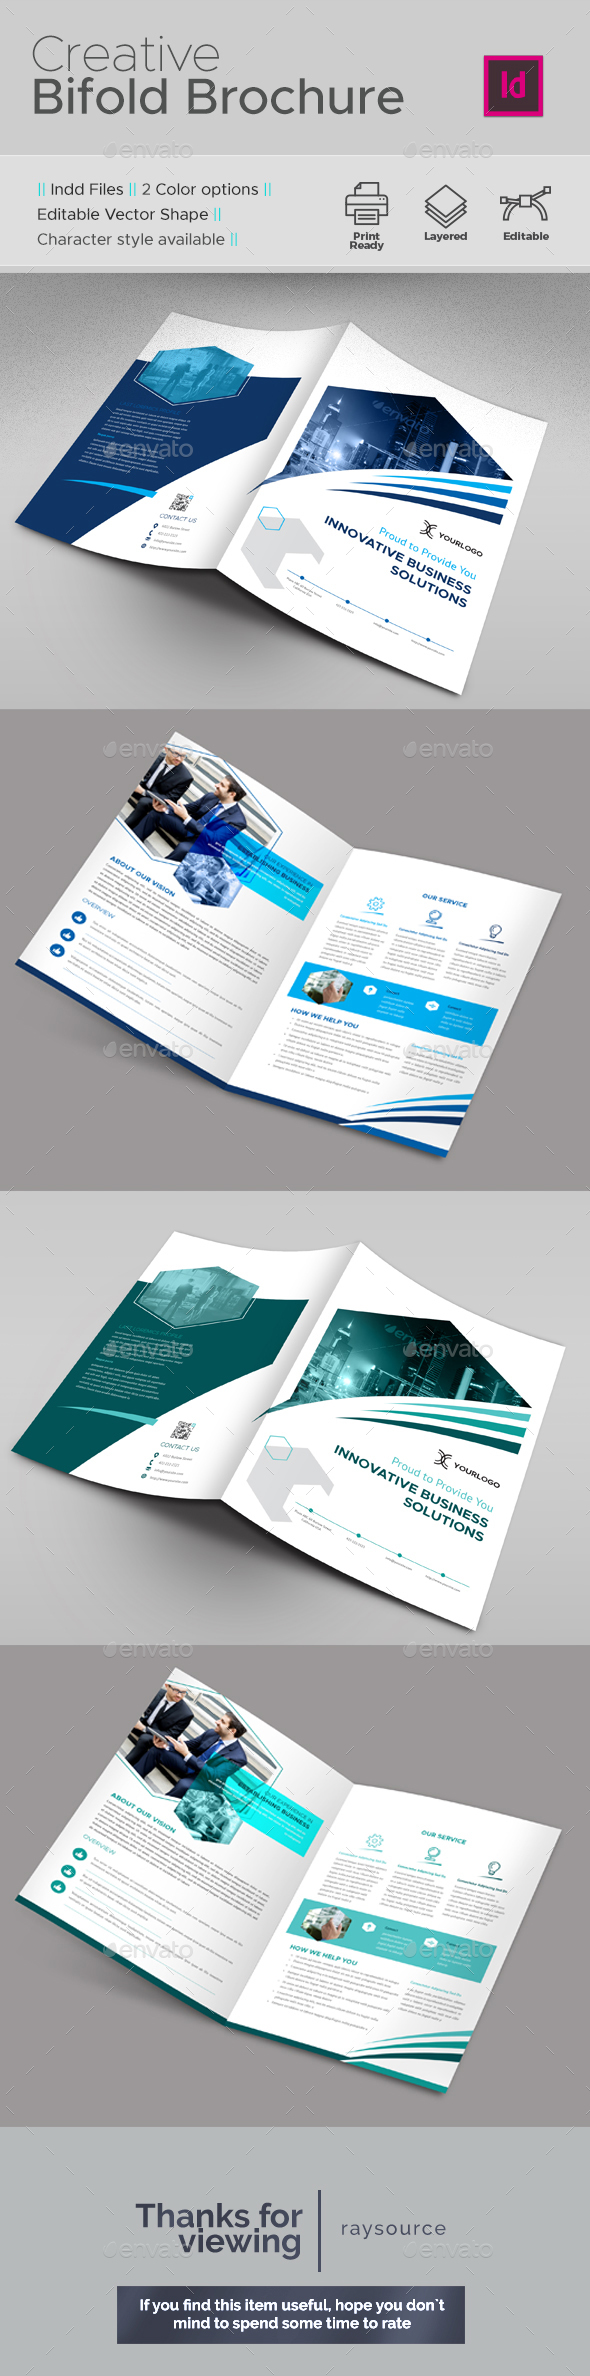 Creative Bifold Brochure - Brochures Print Templates